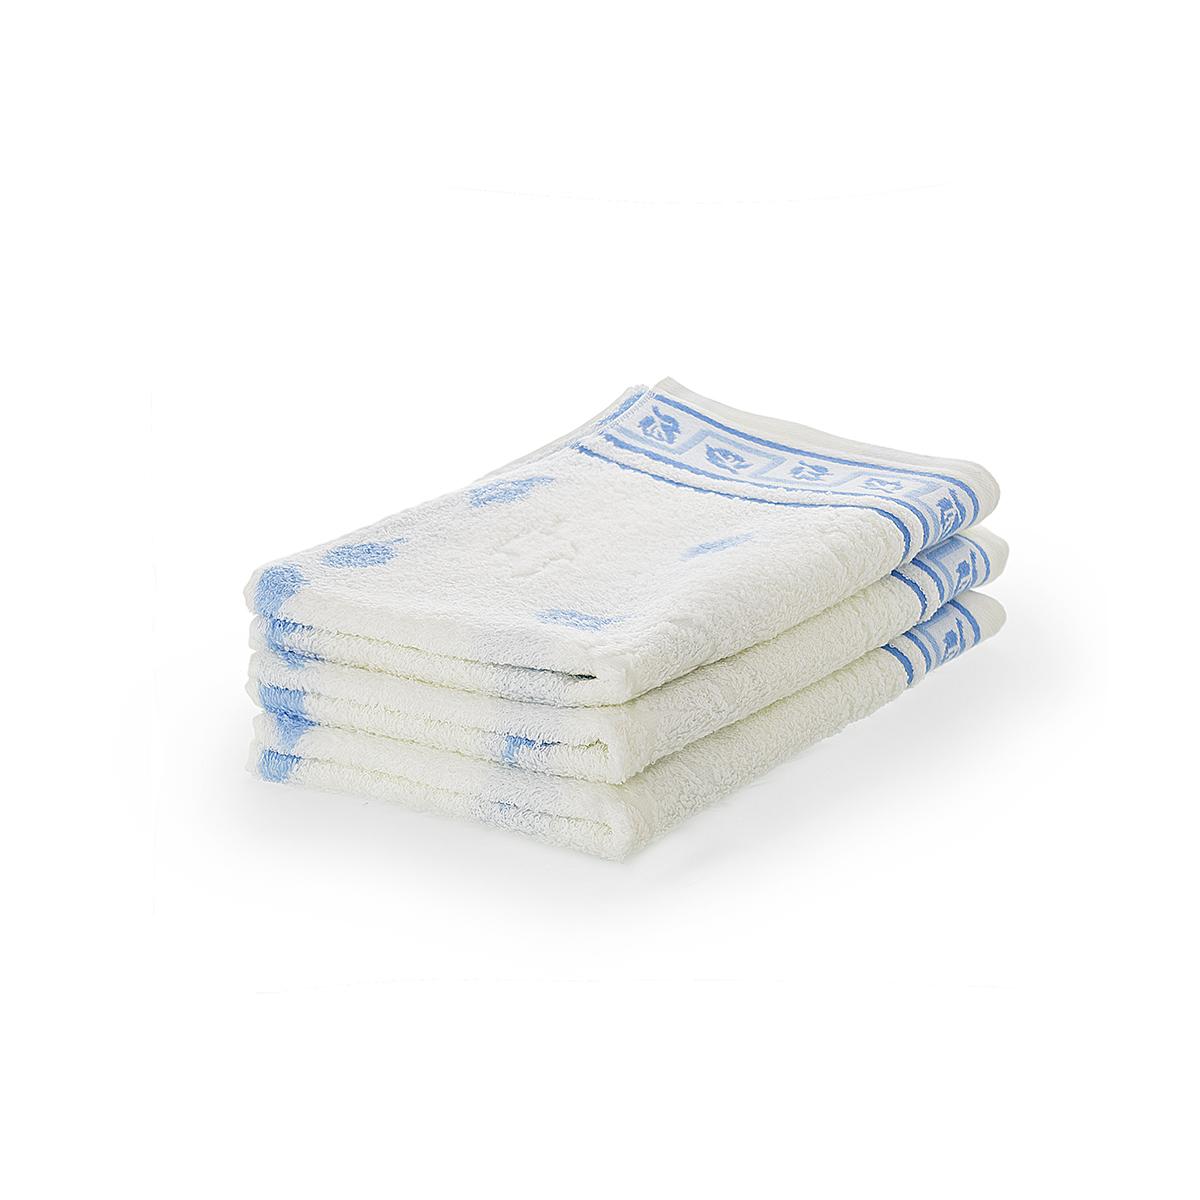 Полотенце Листопад Голубой, размер 34х78 смМахровые полотенца<br>Плотность ткани: 480 г/кв. м.<br><br>Тип: Полотенце<br>Размер: 34х78<br>Материал: Махра